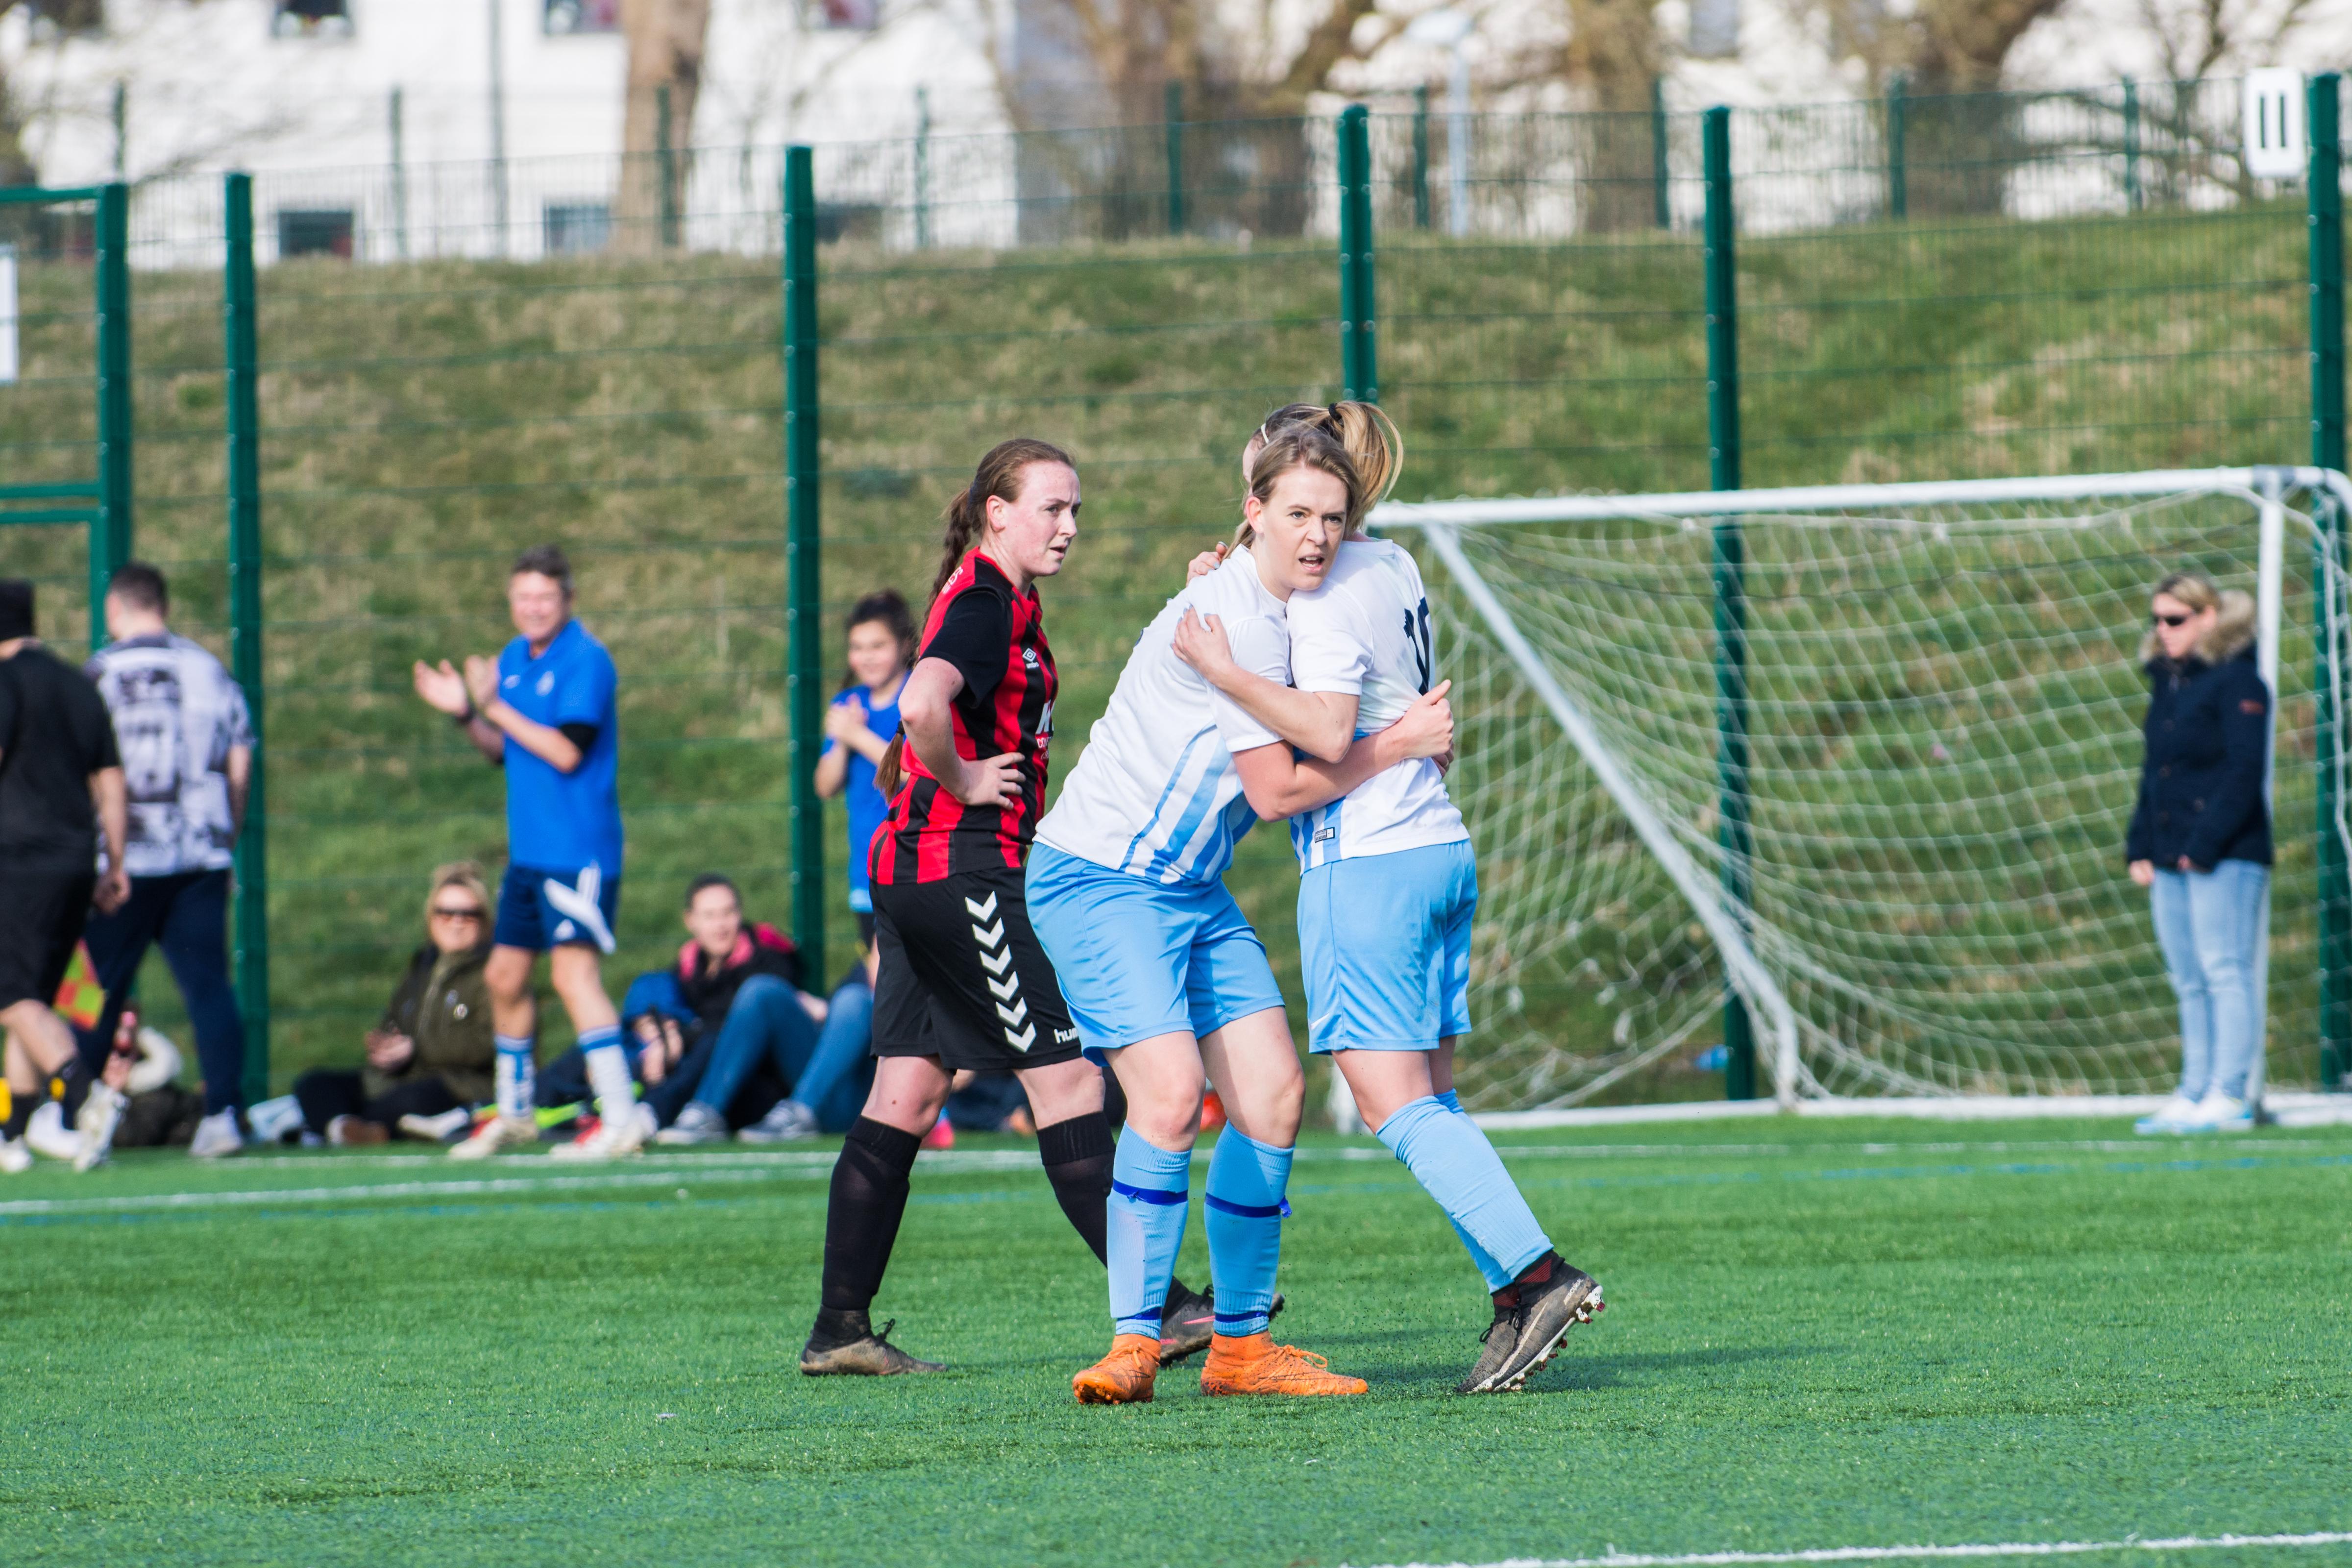 DAVID_JEFFERY Saltdean Utd Ladies FC vs Worthing Utd Ladies FC 11.03.18 16